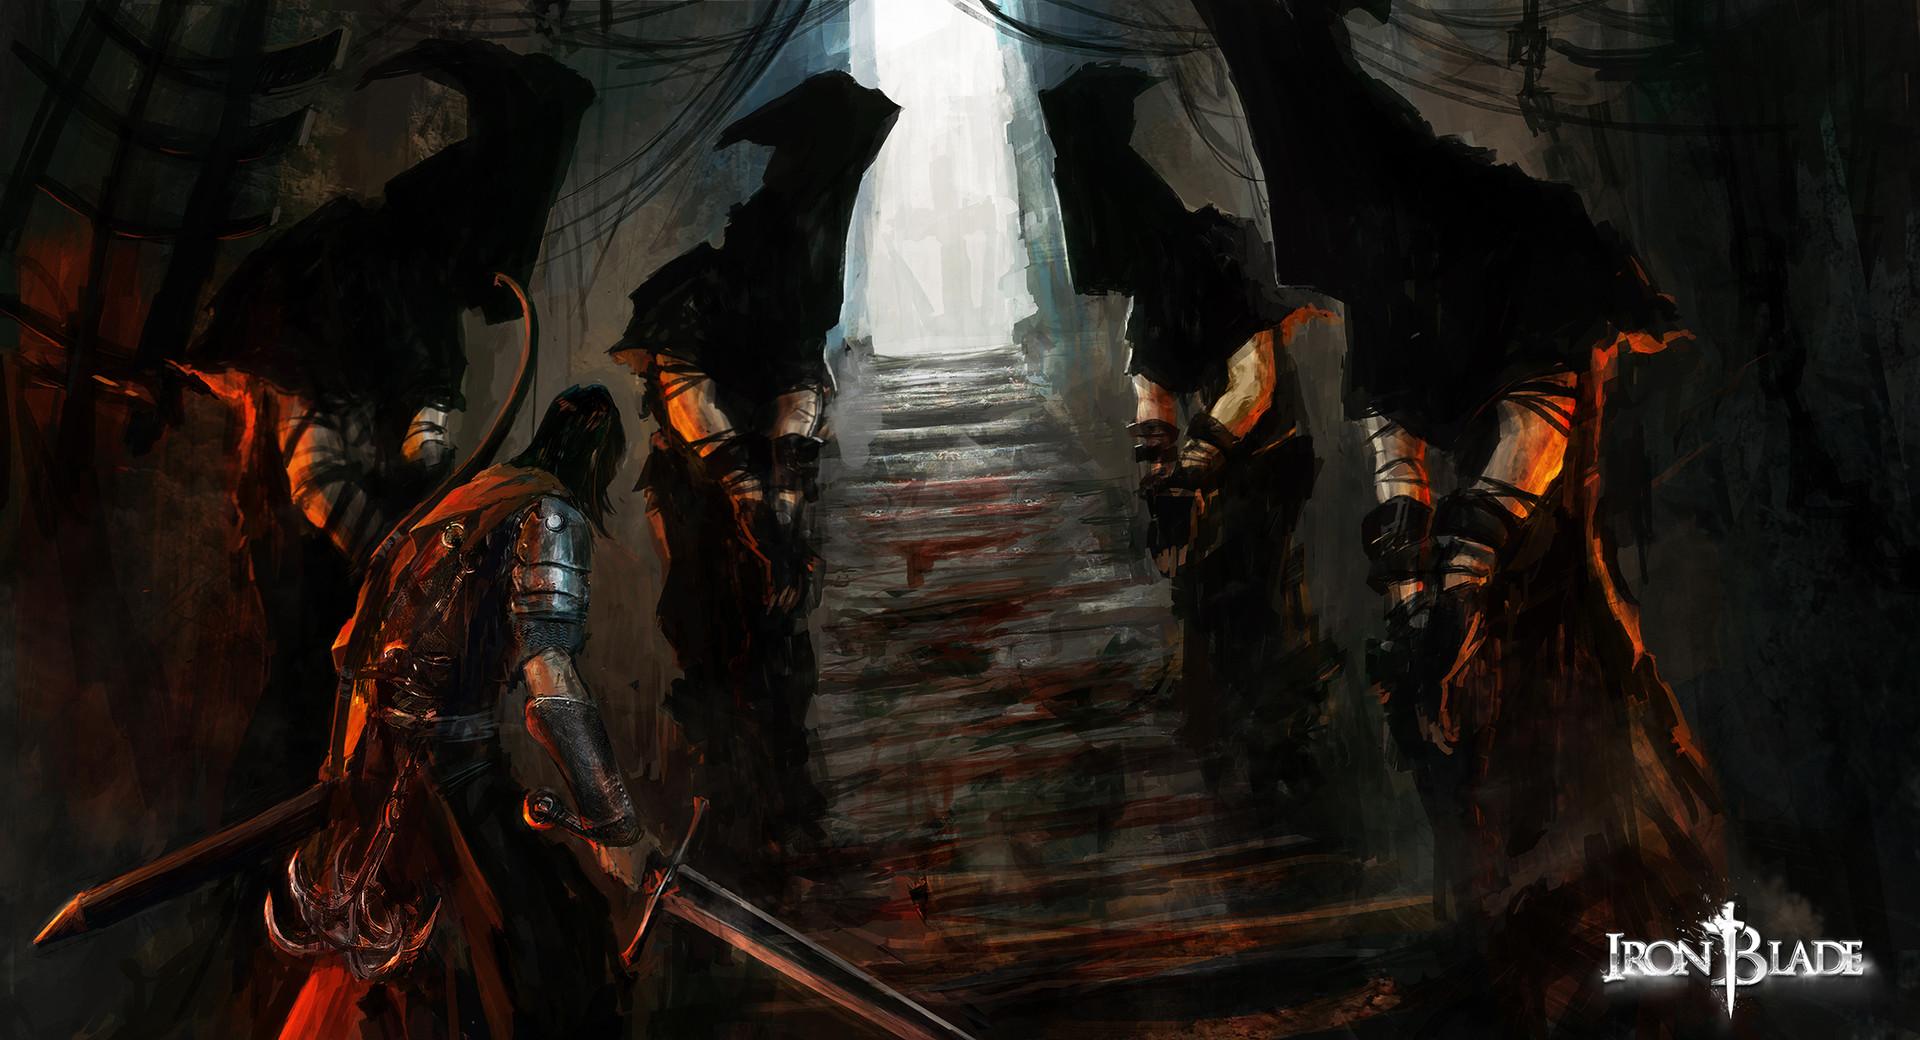 Alexandre chaudret gca characters ennemies situation 09